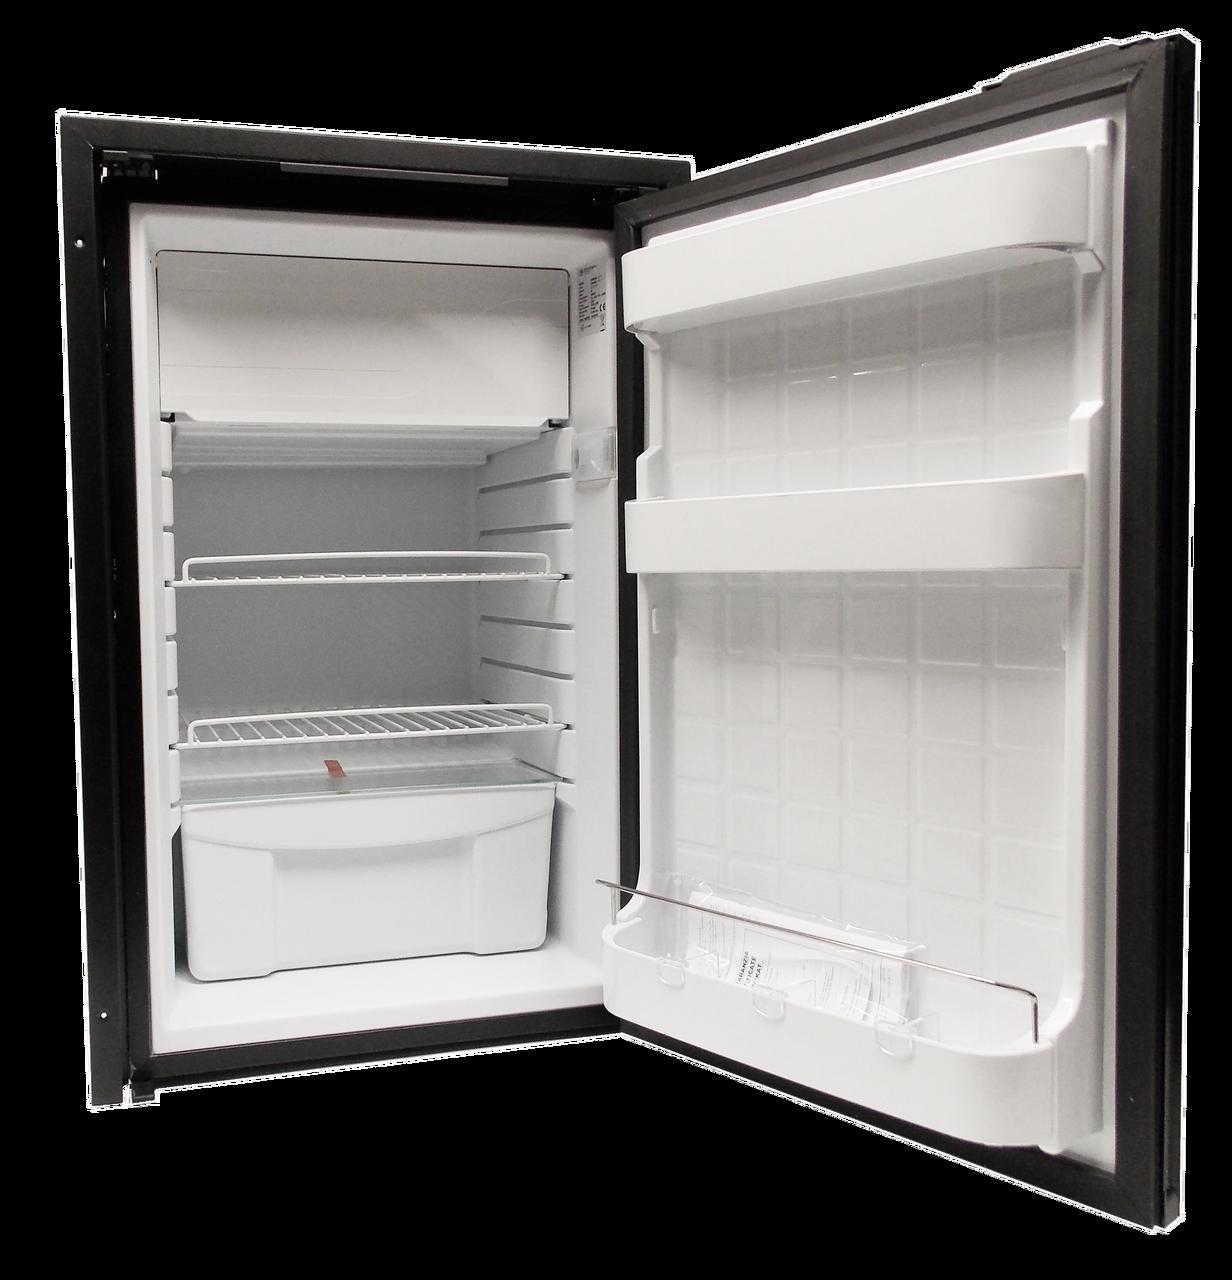 Vitrifrigo C85ibd4 F 1 Rv Electric Refrigerator Freezer Black Ac Dc 3 2 Cf Small Refrigerator Refrigerator Freezer Rv Refrigerator